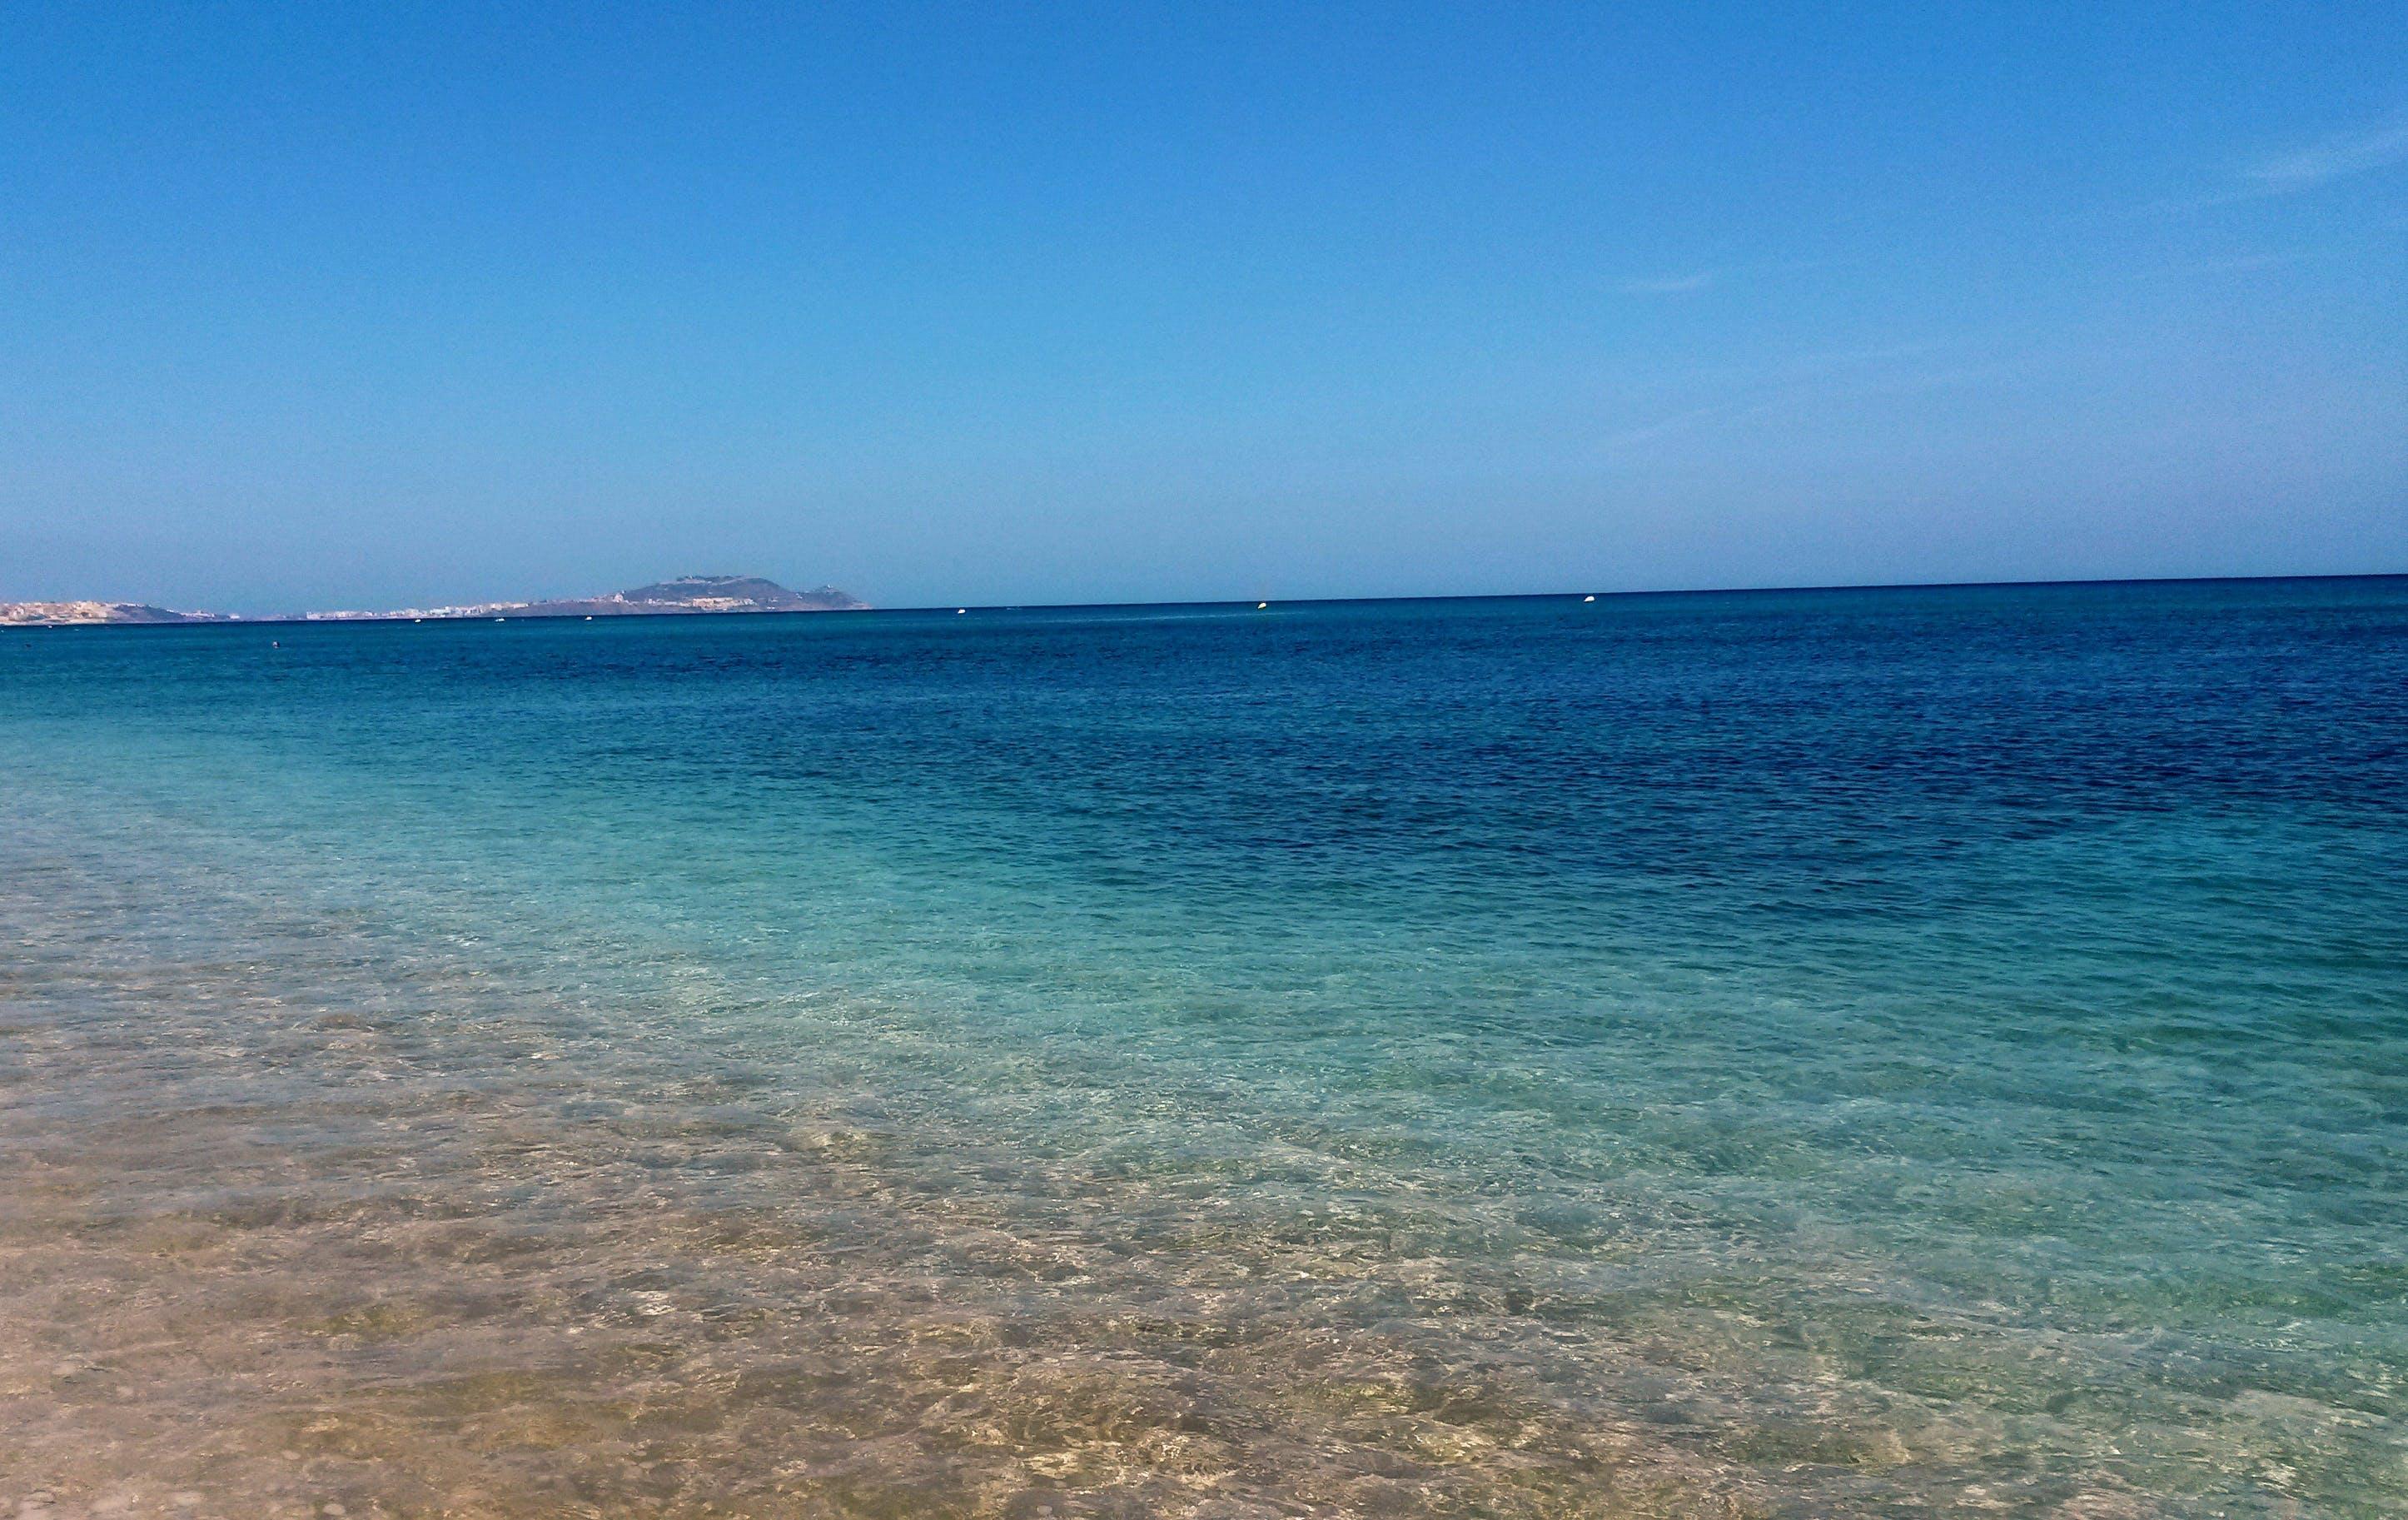 Blue Seashore Beach at Daylight Photography